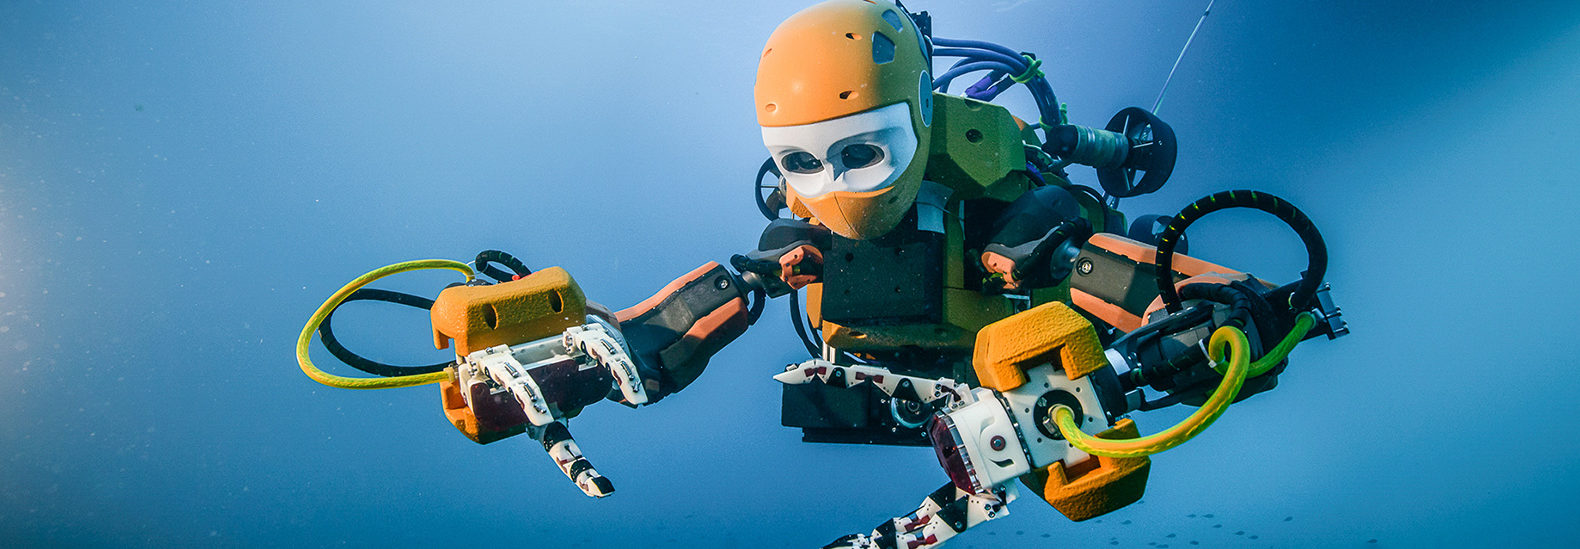 Sanford-Human-Robot-Diver-1580x549